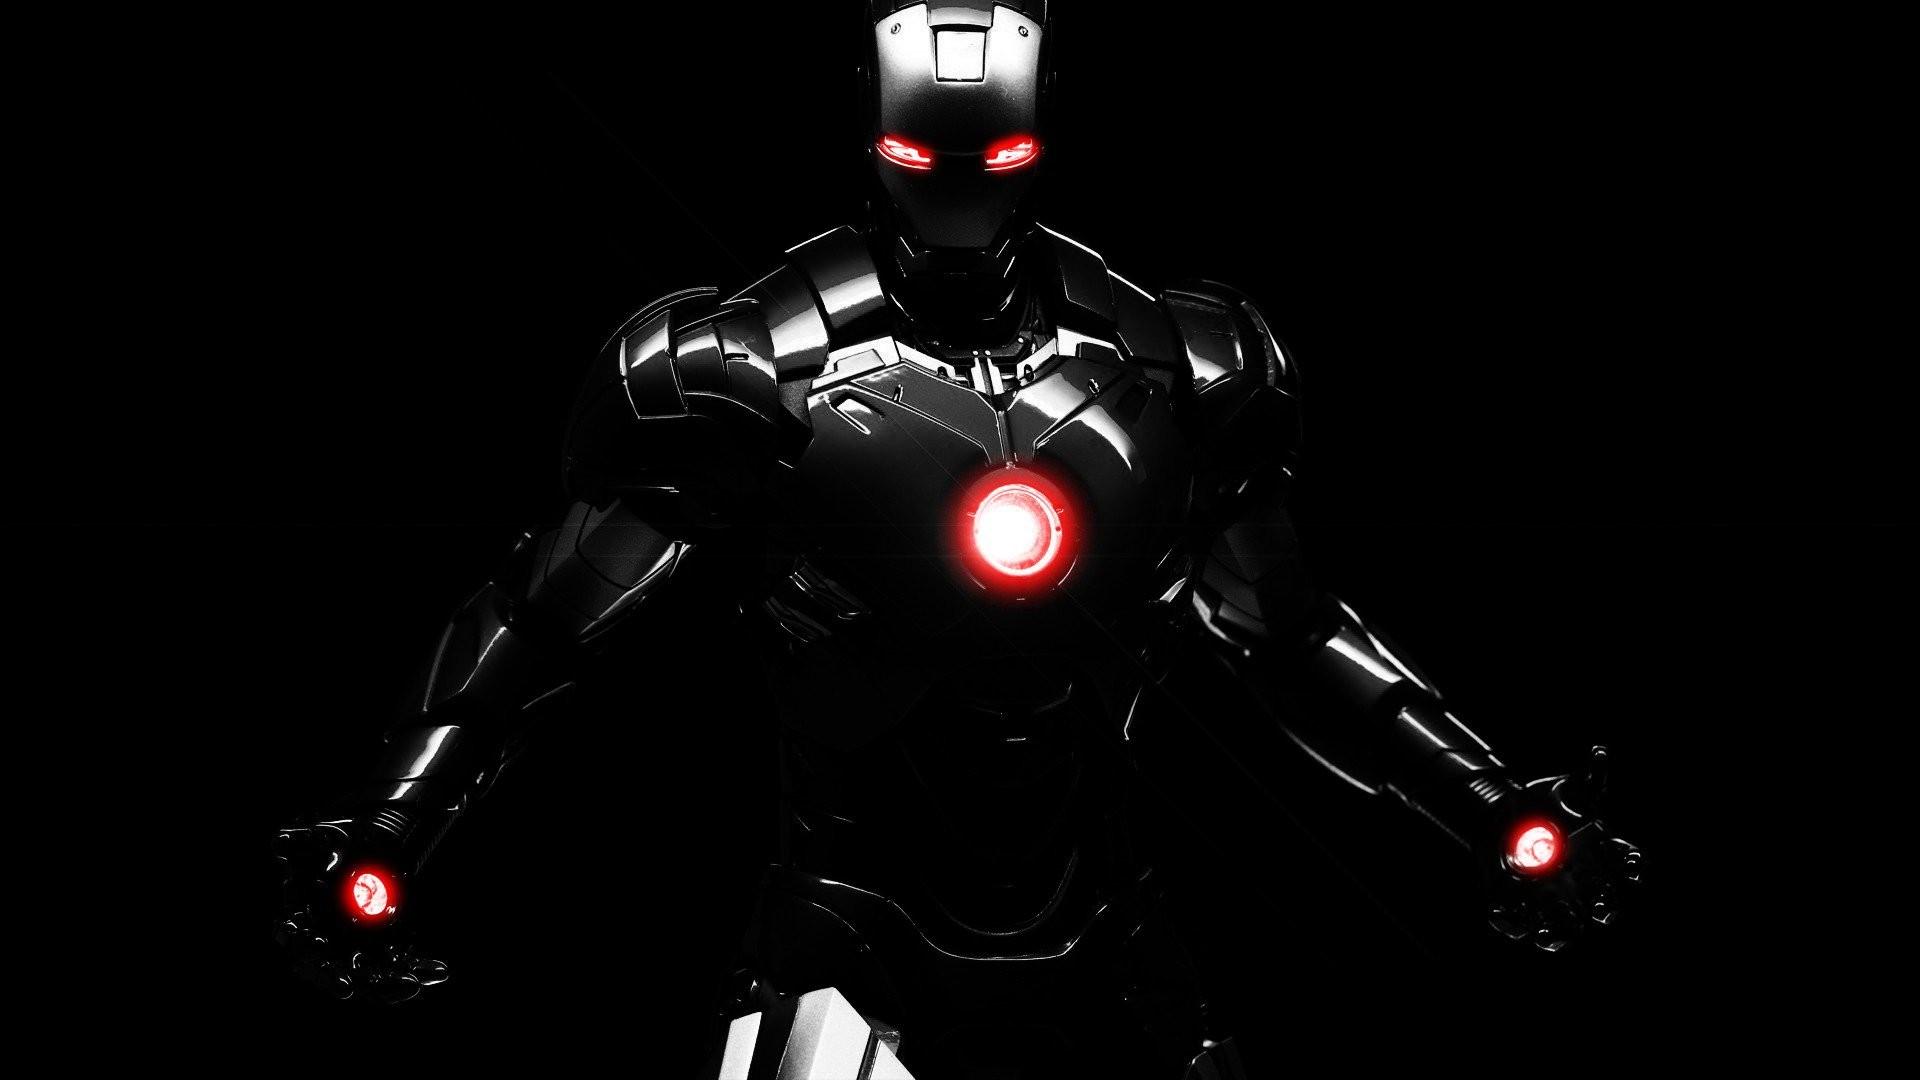 290955-blackangel 416035 iron_man_super_hero_superheroes_marvel_hd-wallpaper-1696760  black-iron-man-background-picture-new-best-hd-